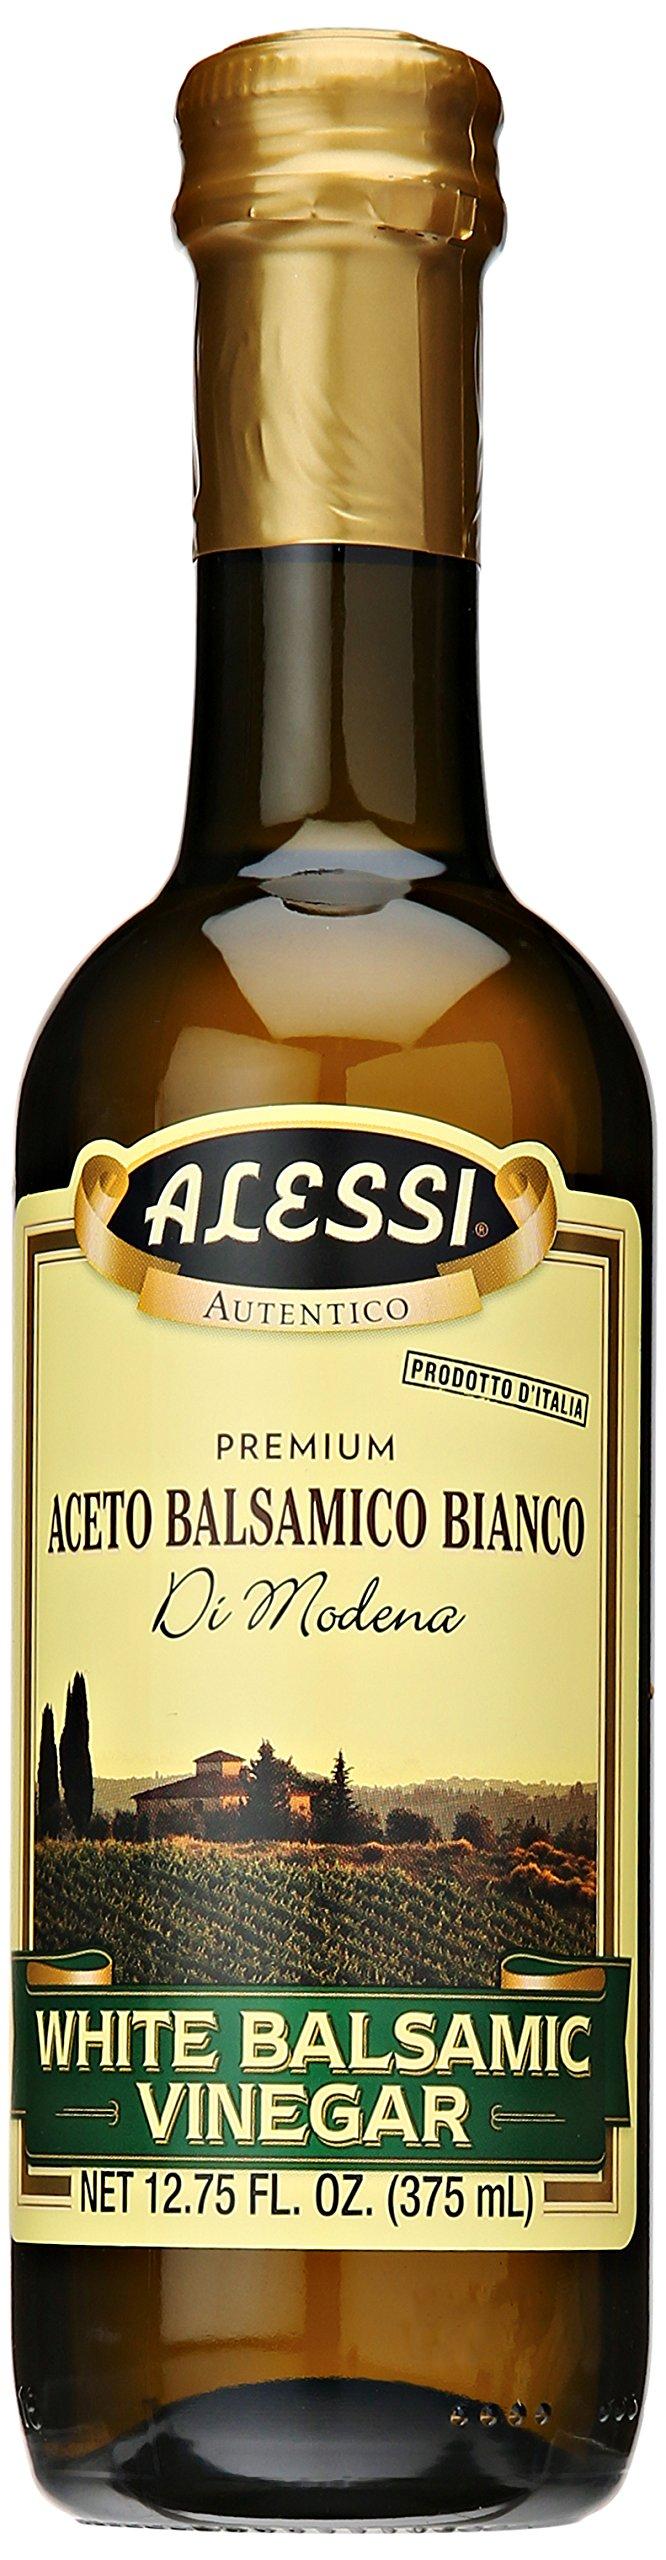 Alessi Regular White Balsamic Vinegar, 12.75 oz